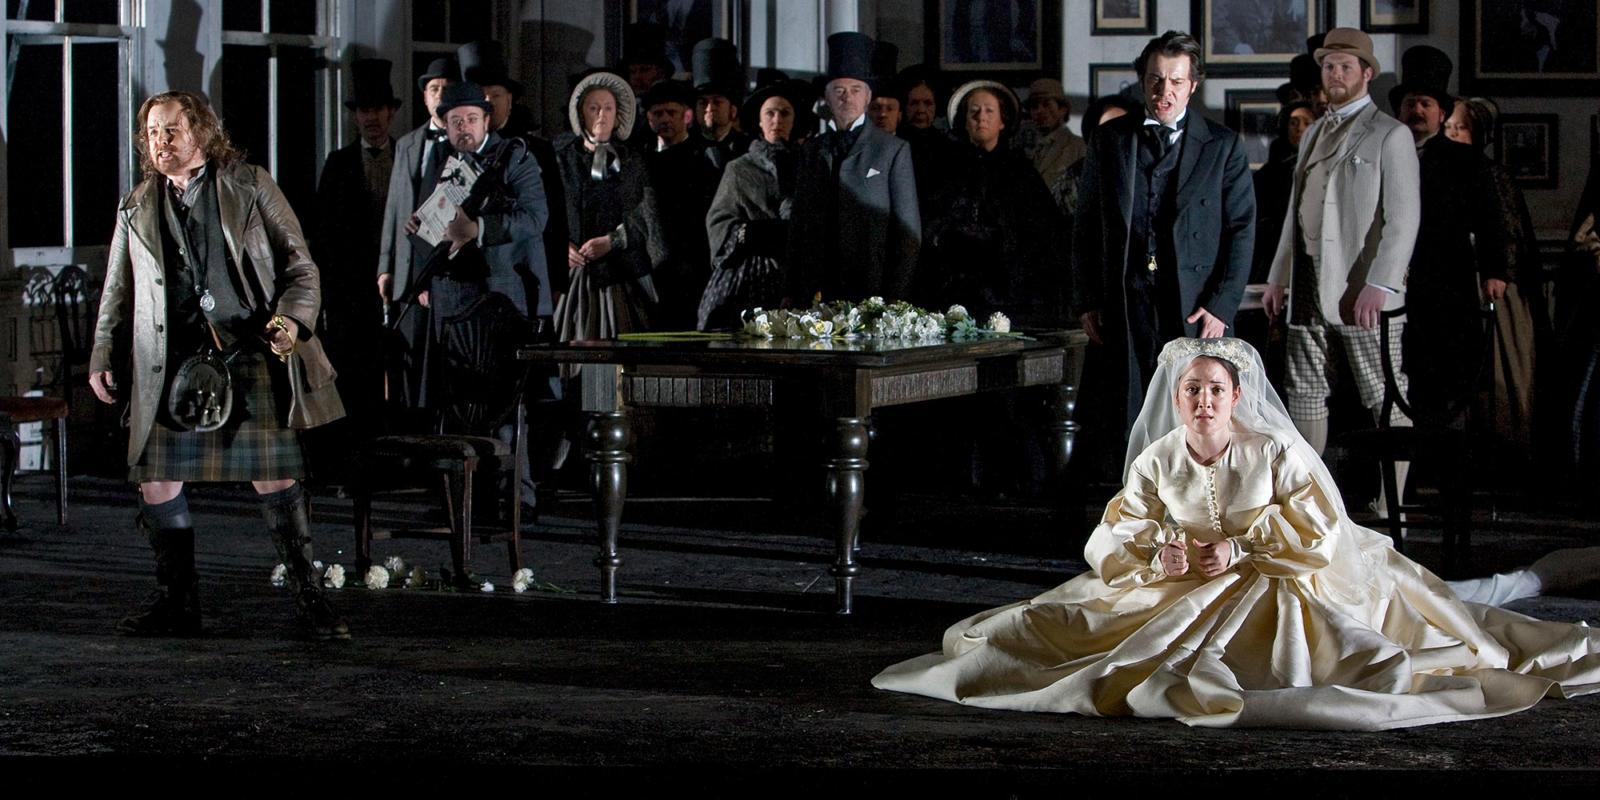 ENO Lucia di Lammermoor Anna Christy Barry Banks and ENO Chorus members (c) Robert Workman